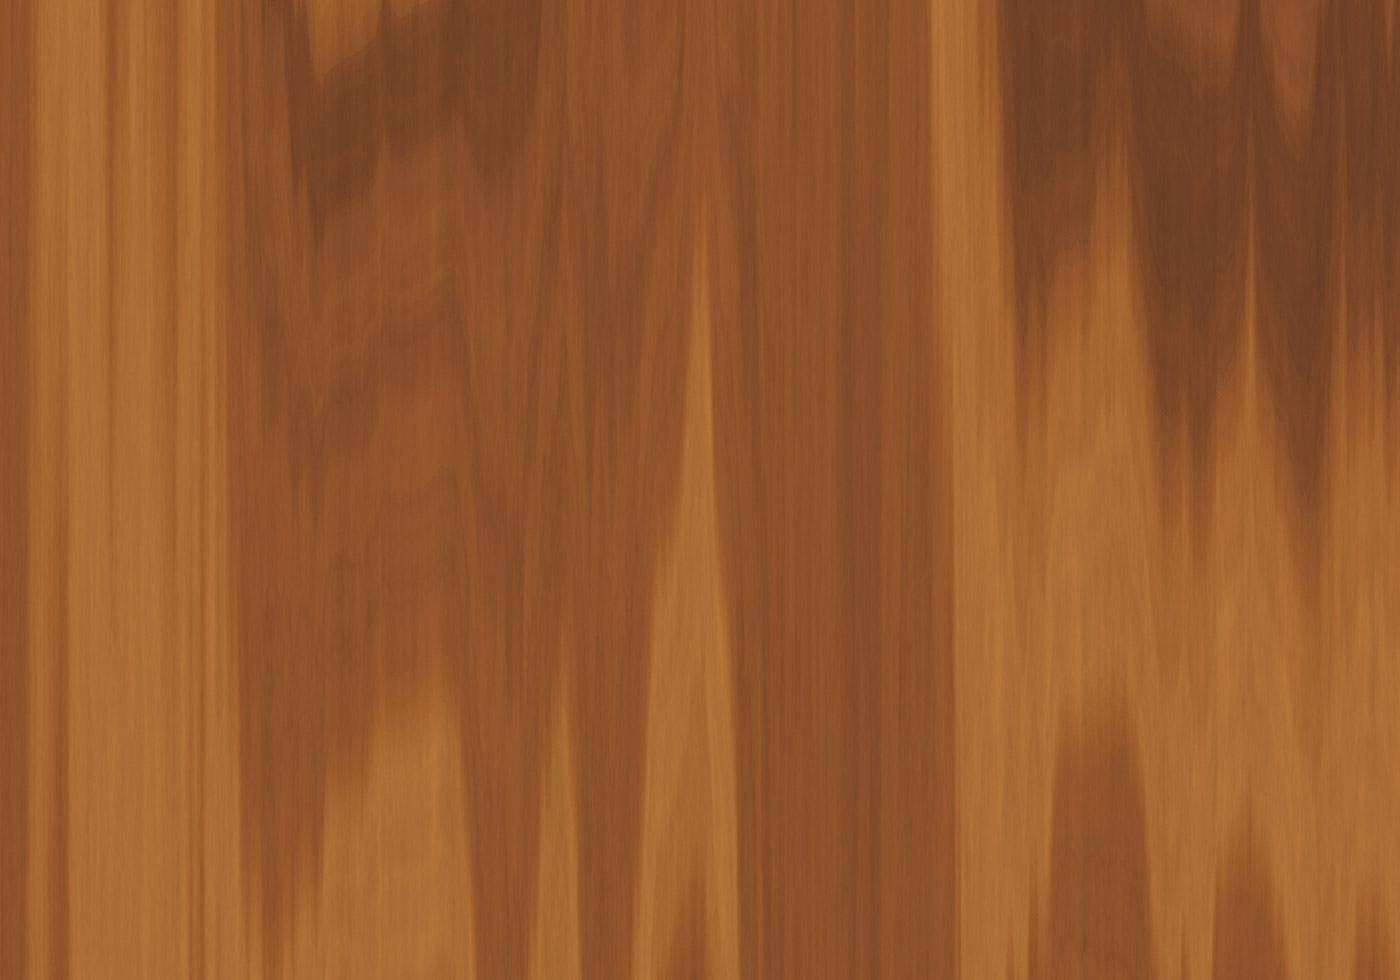 Wood Grain Wallpaper Hd: High Definition Pine Wood Grain Texture